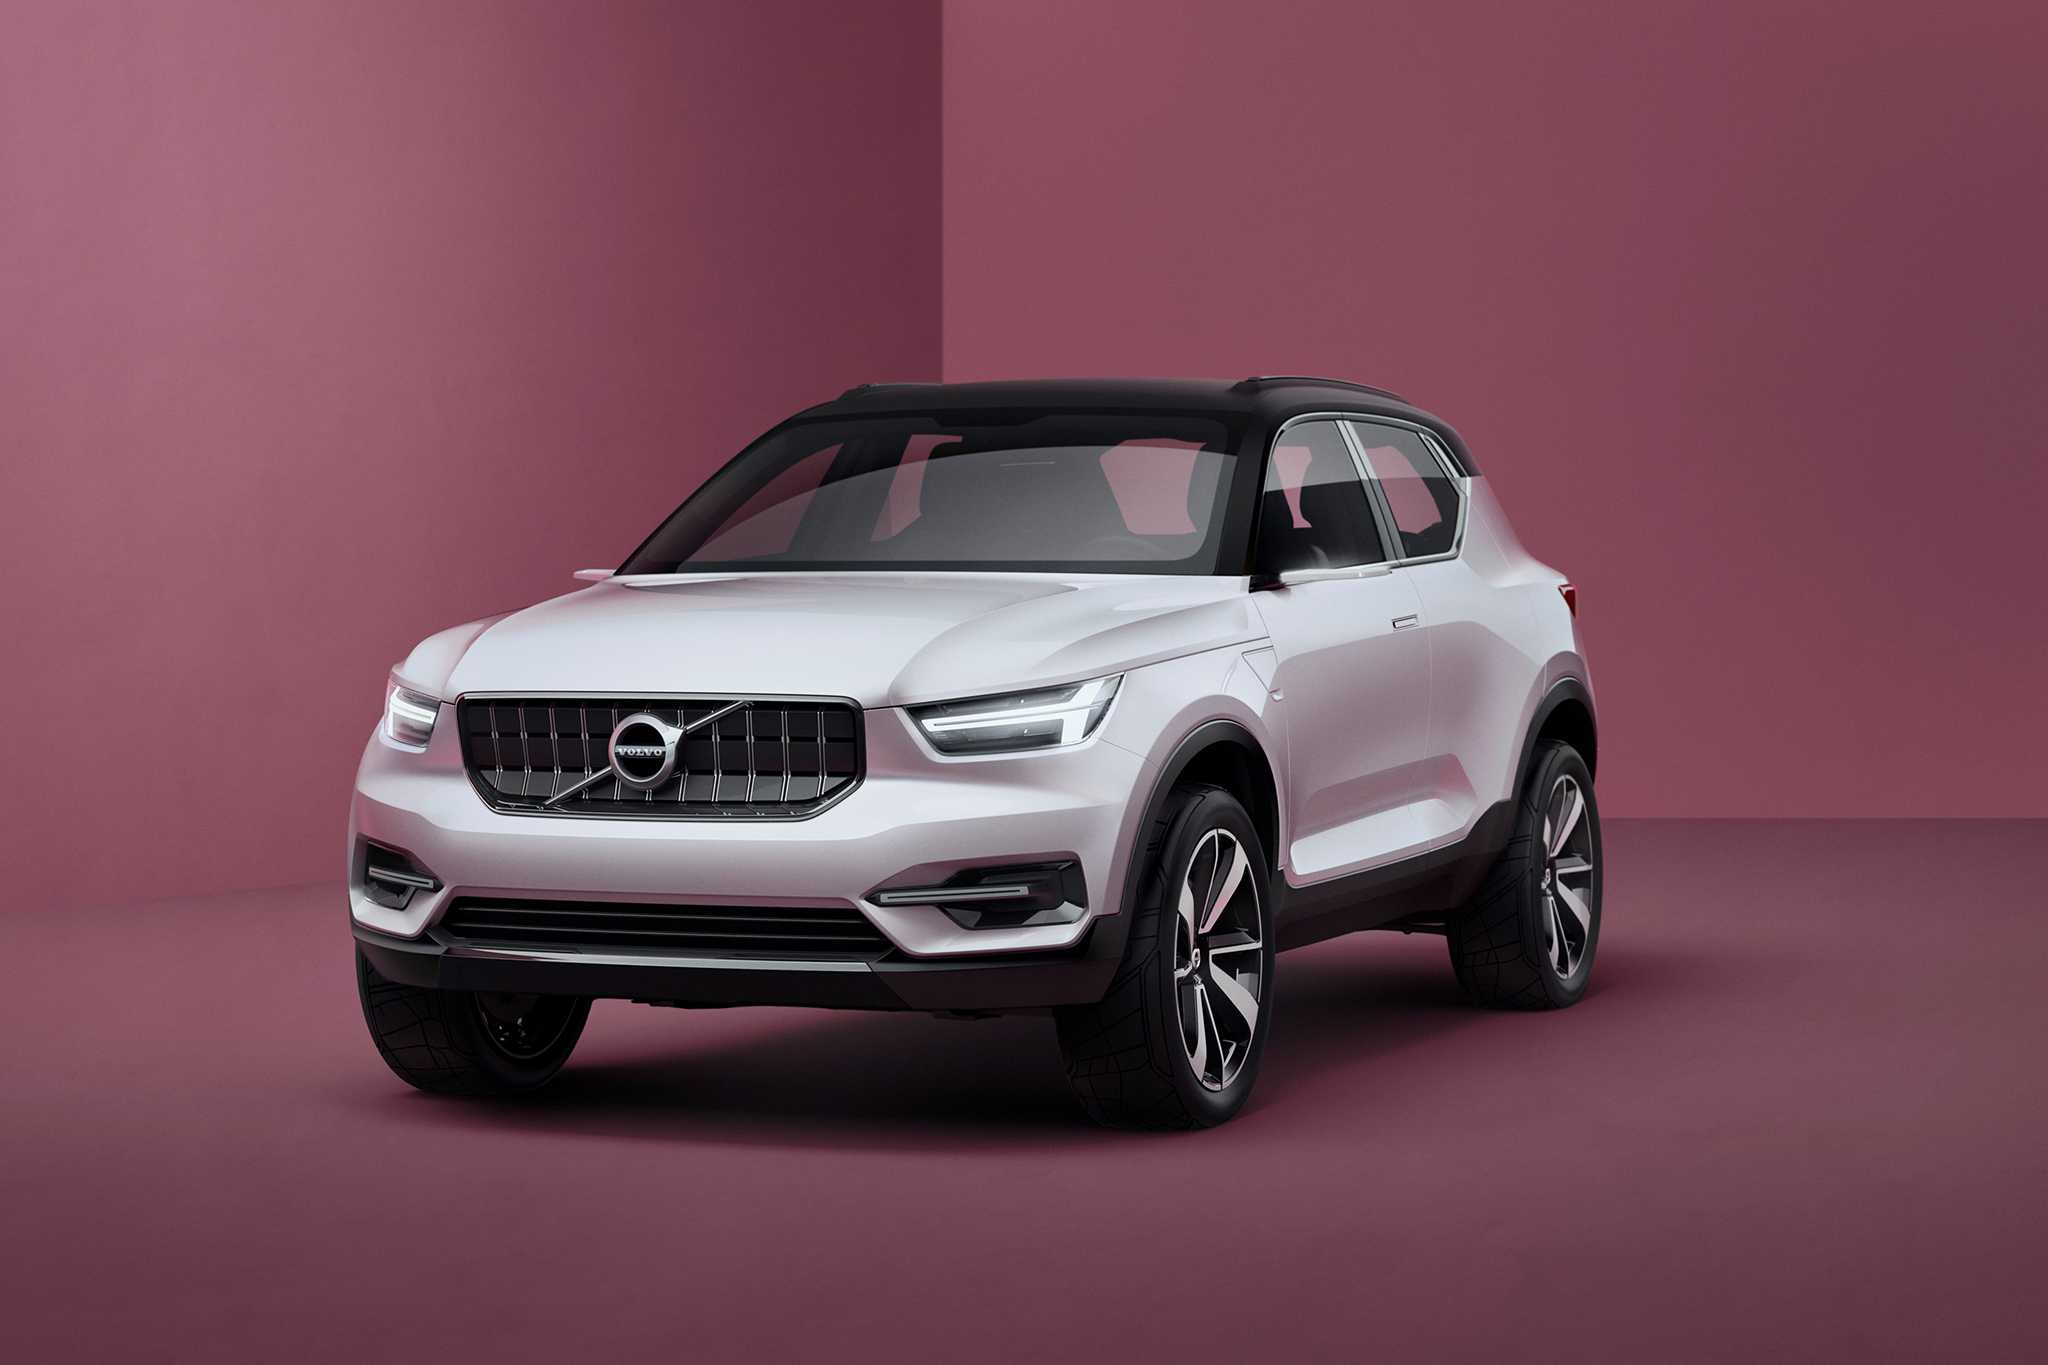 Volvo Reveals 40 Series Entry Level Models After Days of Teaser Images